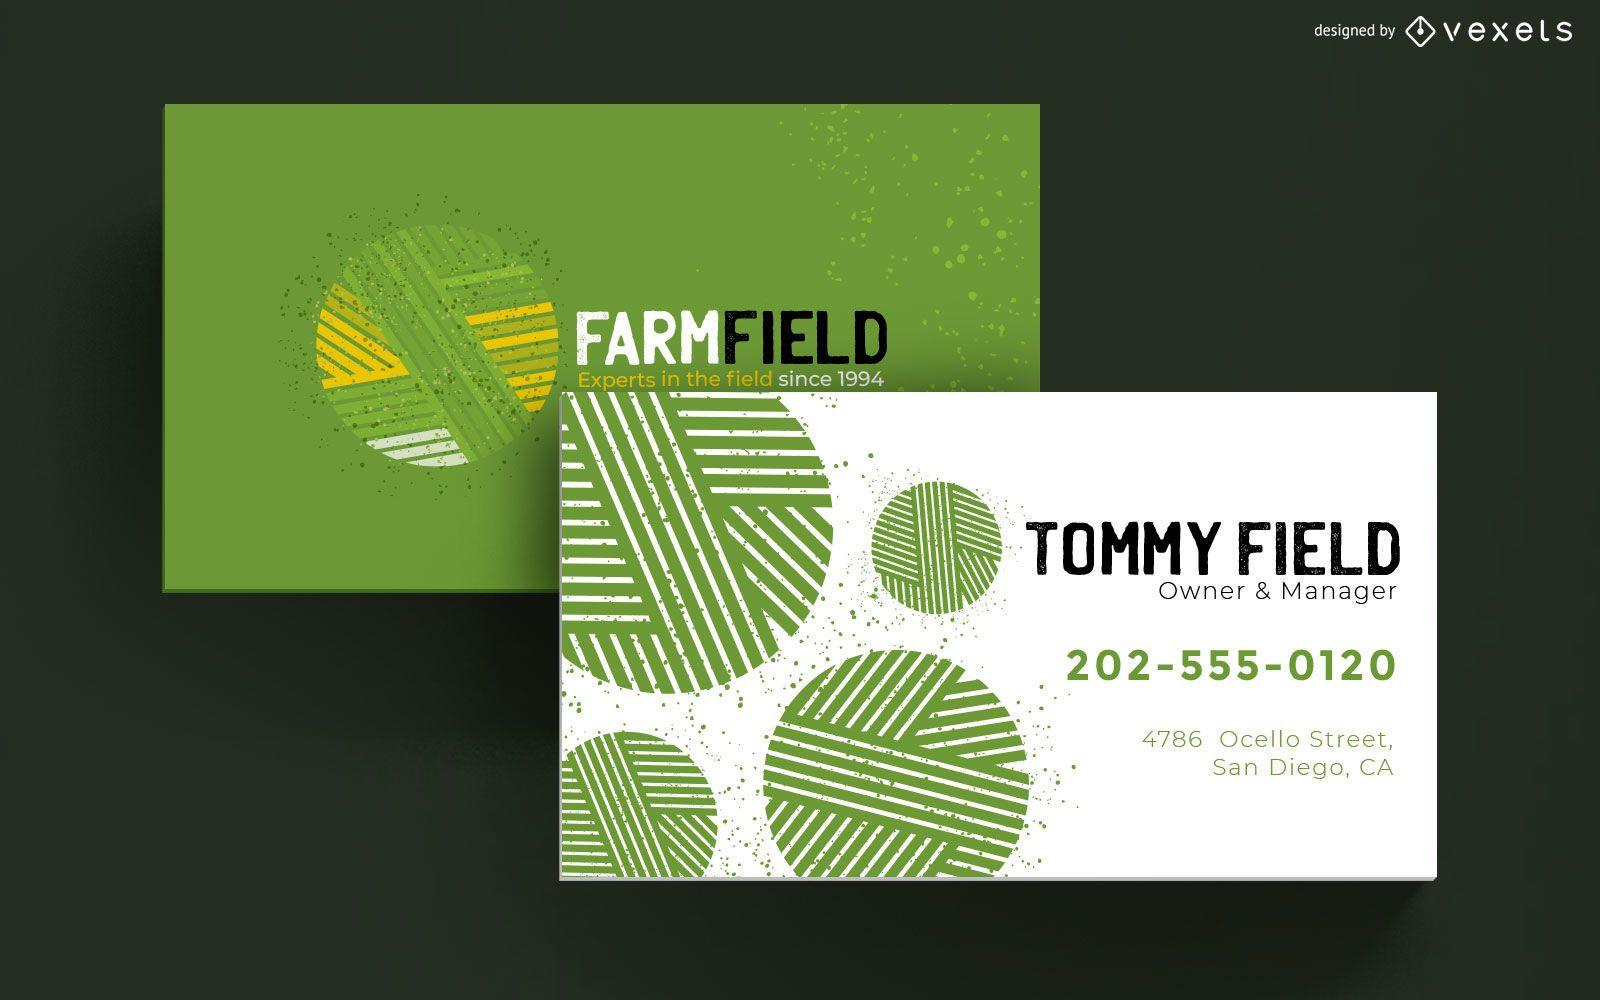 Farm field business card